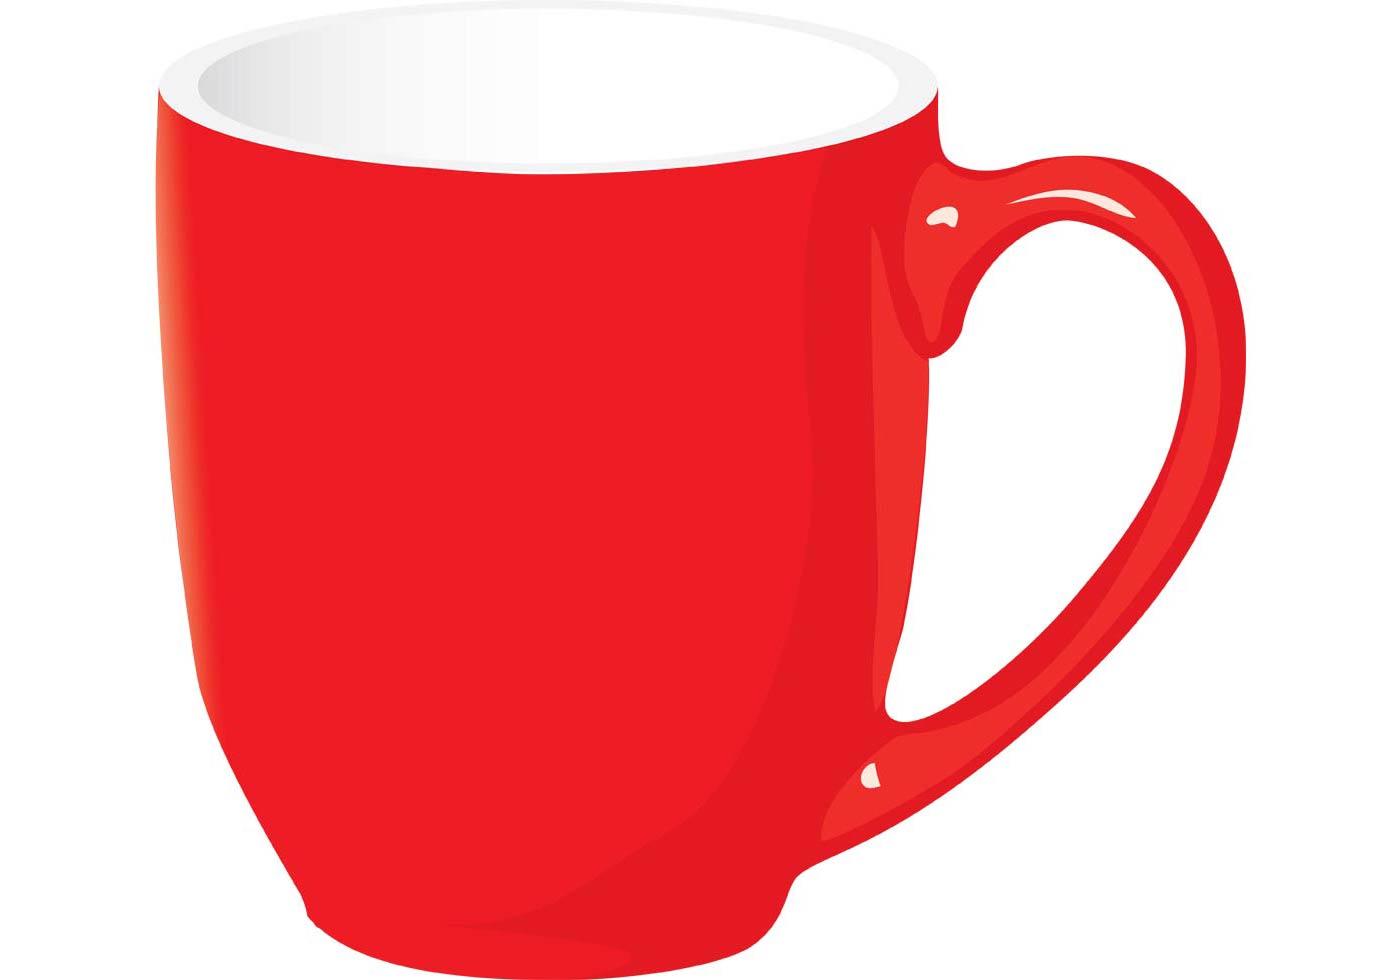 Coffee Mug Vector - Download Free Vector Art, Stock ...